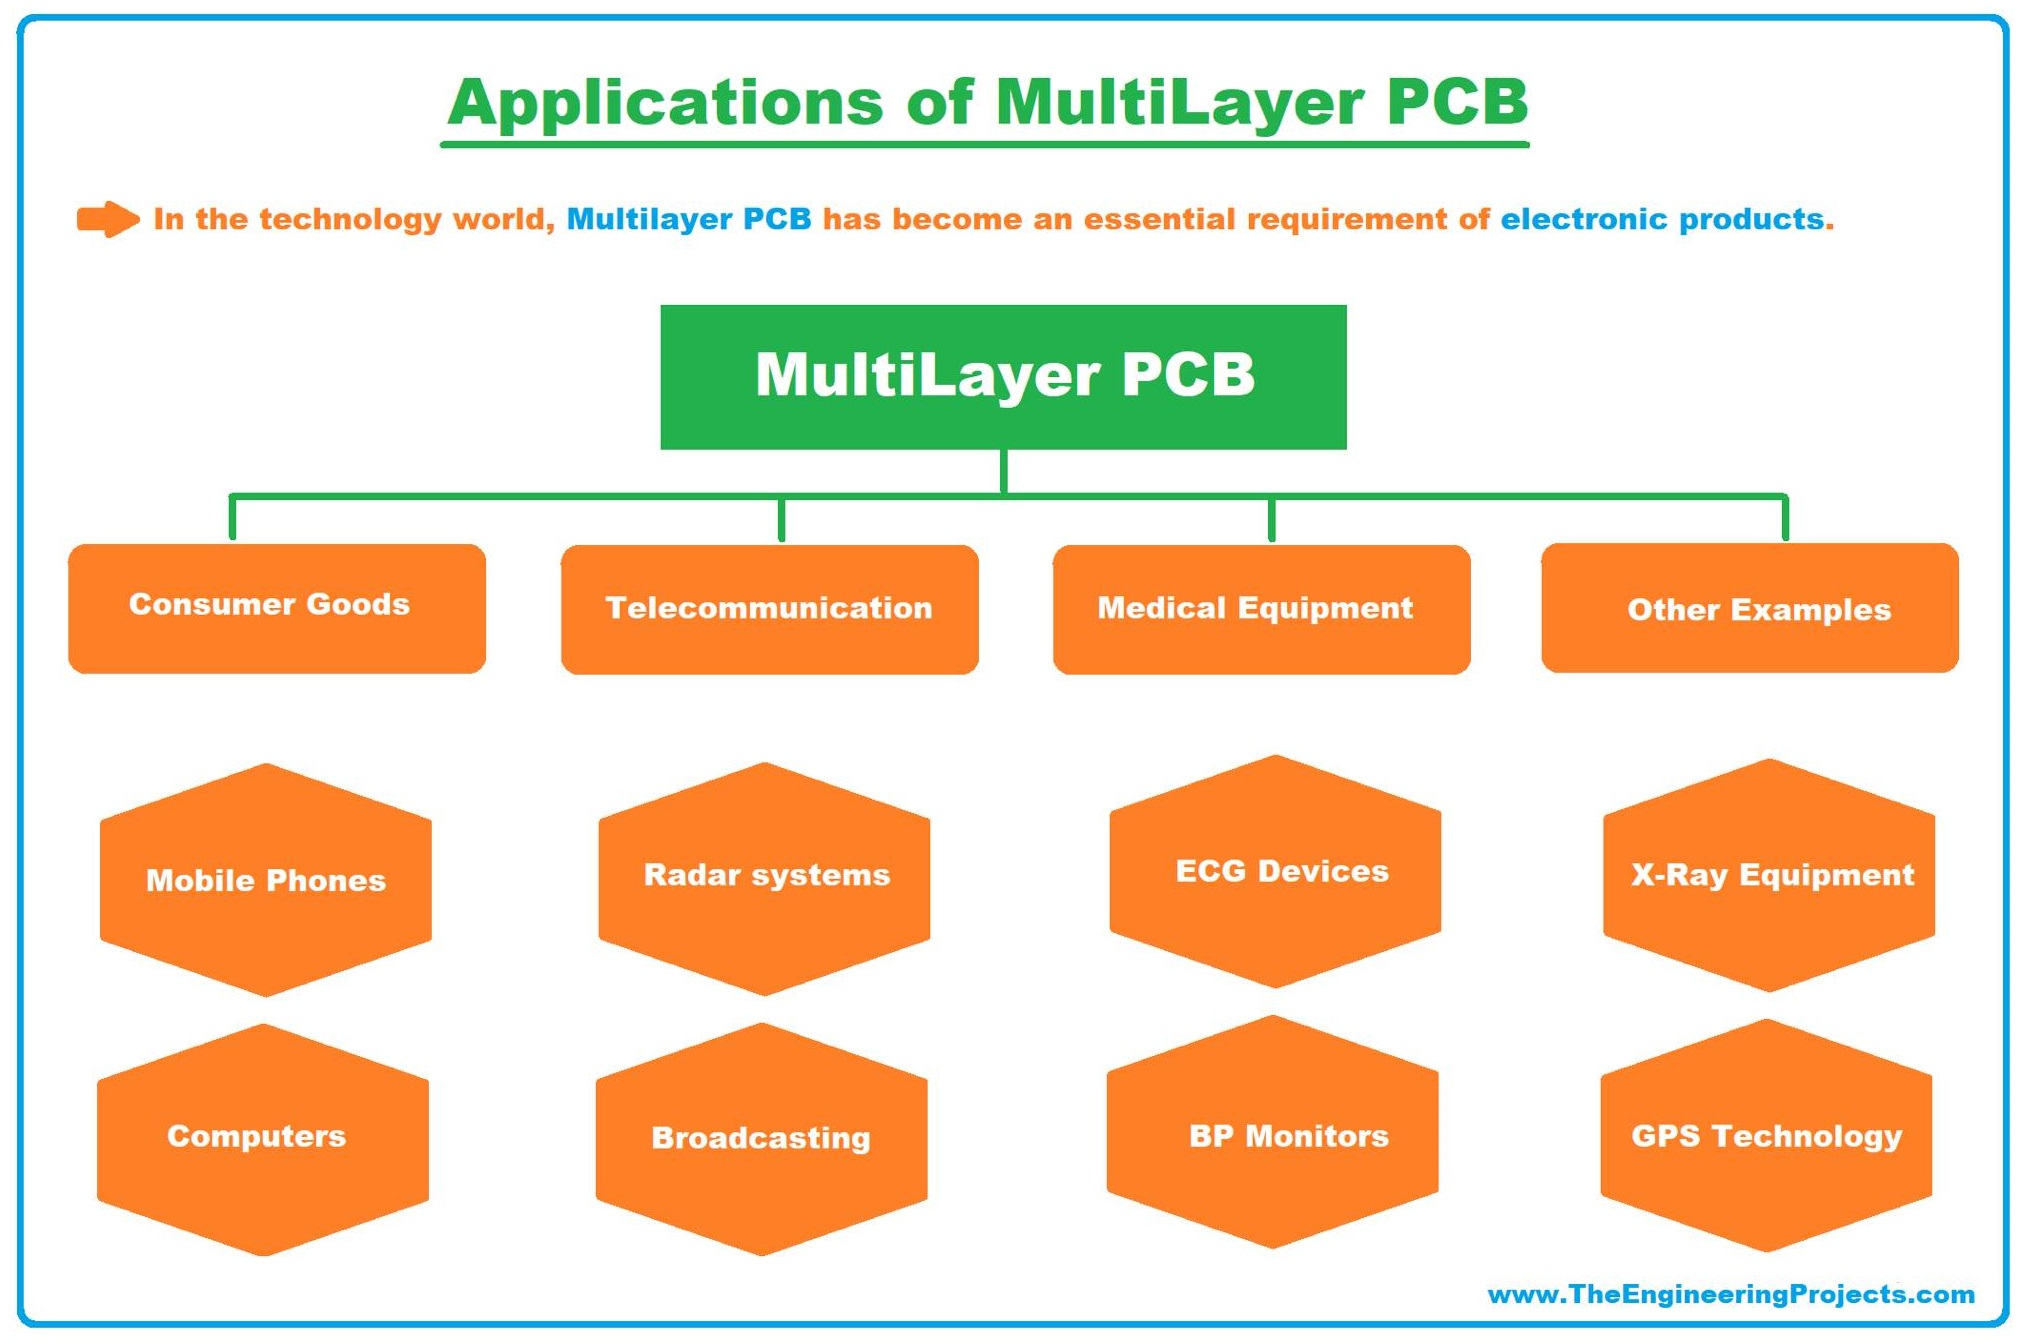 Multilayer PCB, what is Multilayer PCB, Multilayer PCB basics, Multilayer PCB examples, Multilayer PCB applications, applications of Multilayer PCB, examples of multilayer pcb